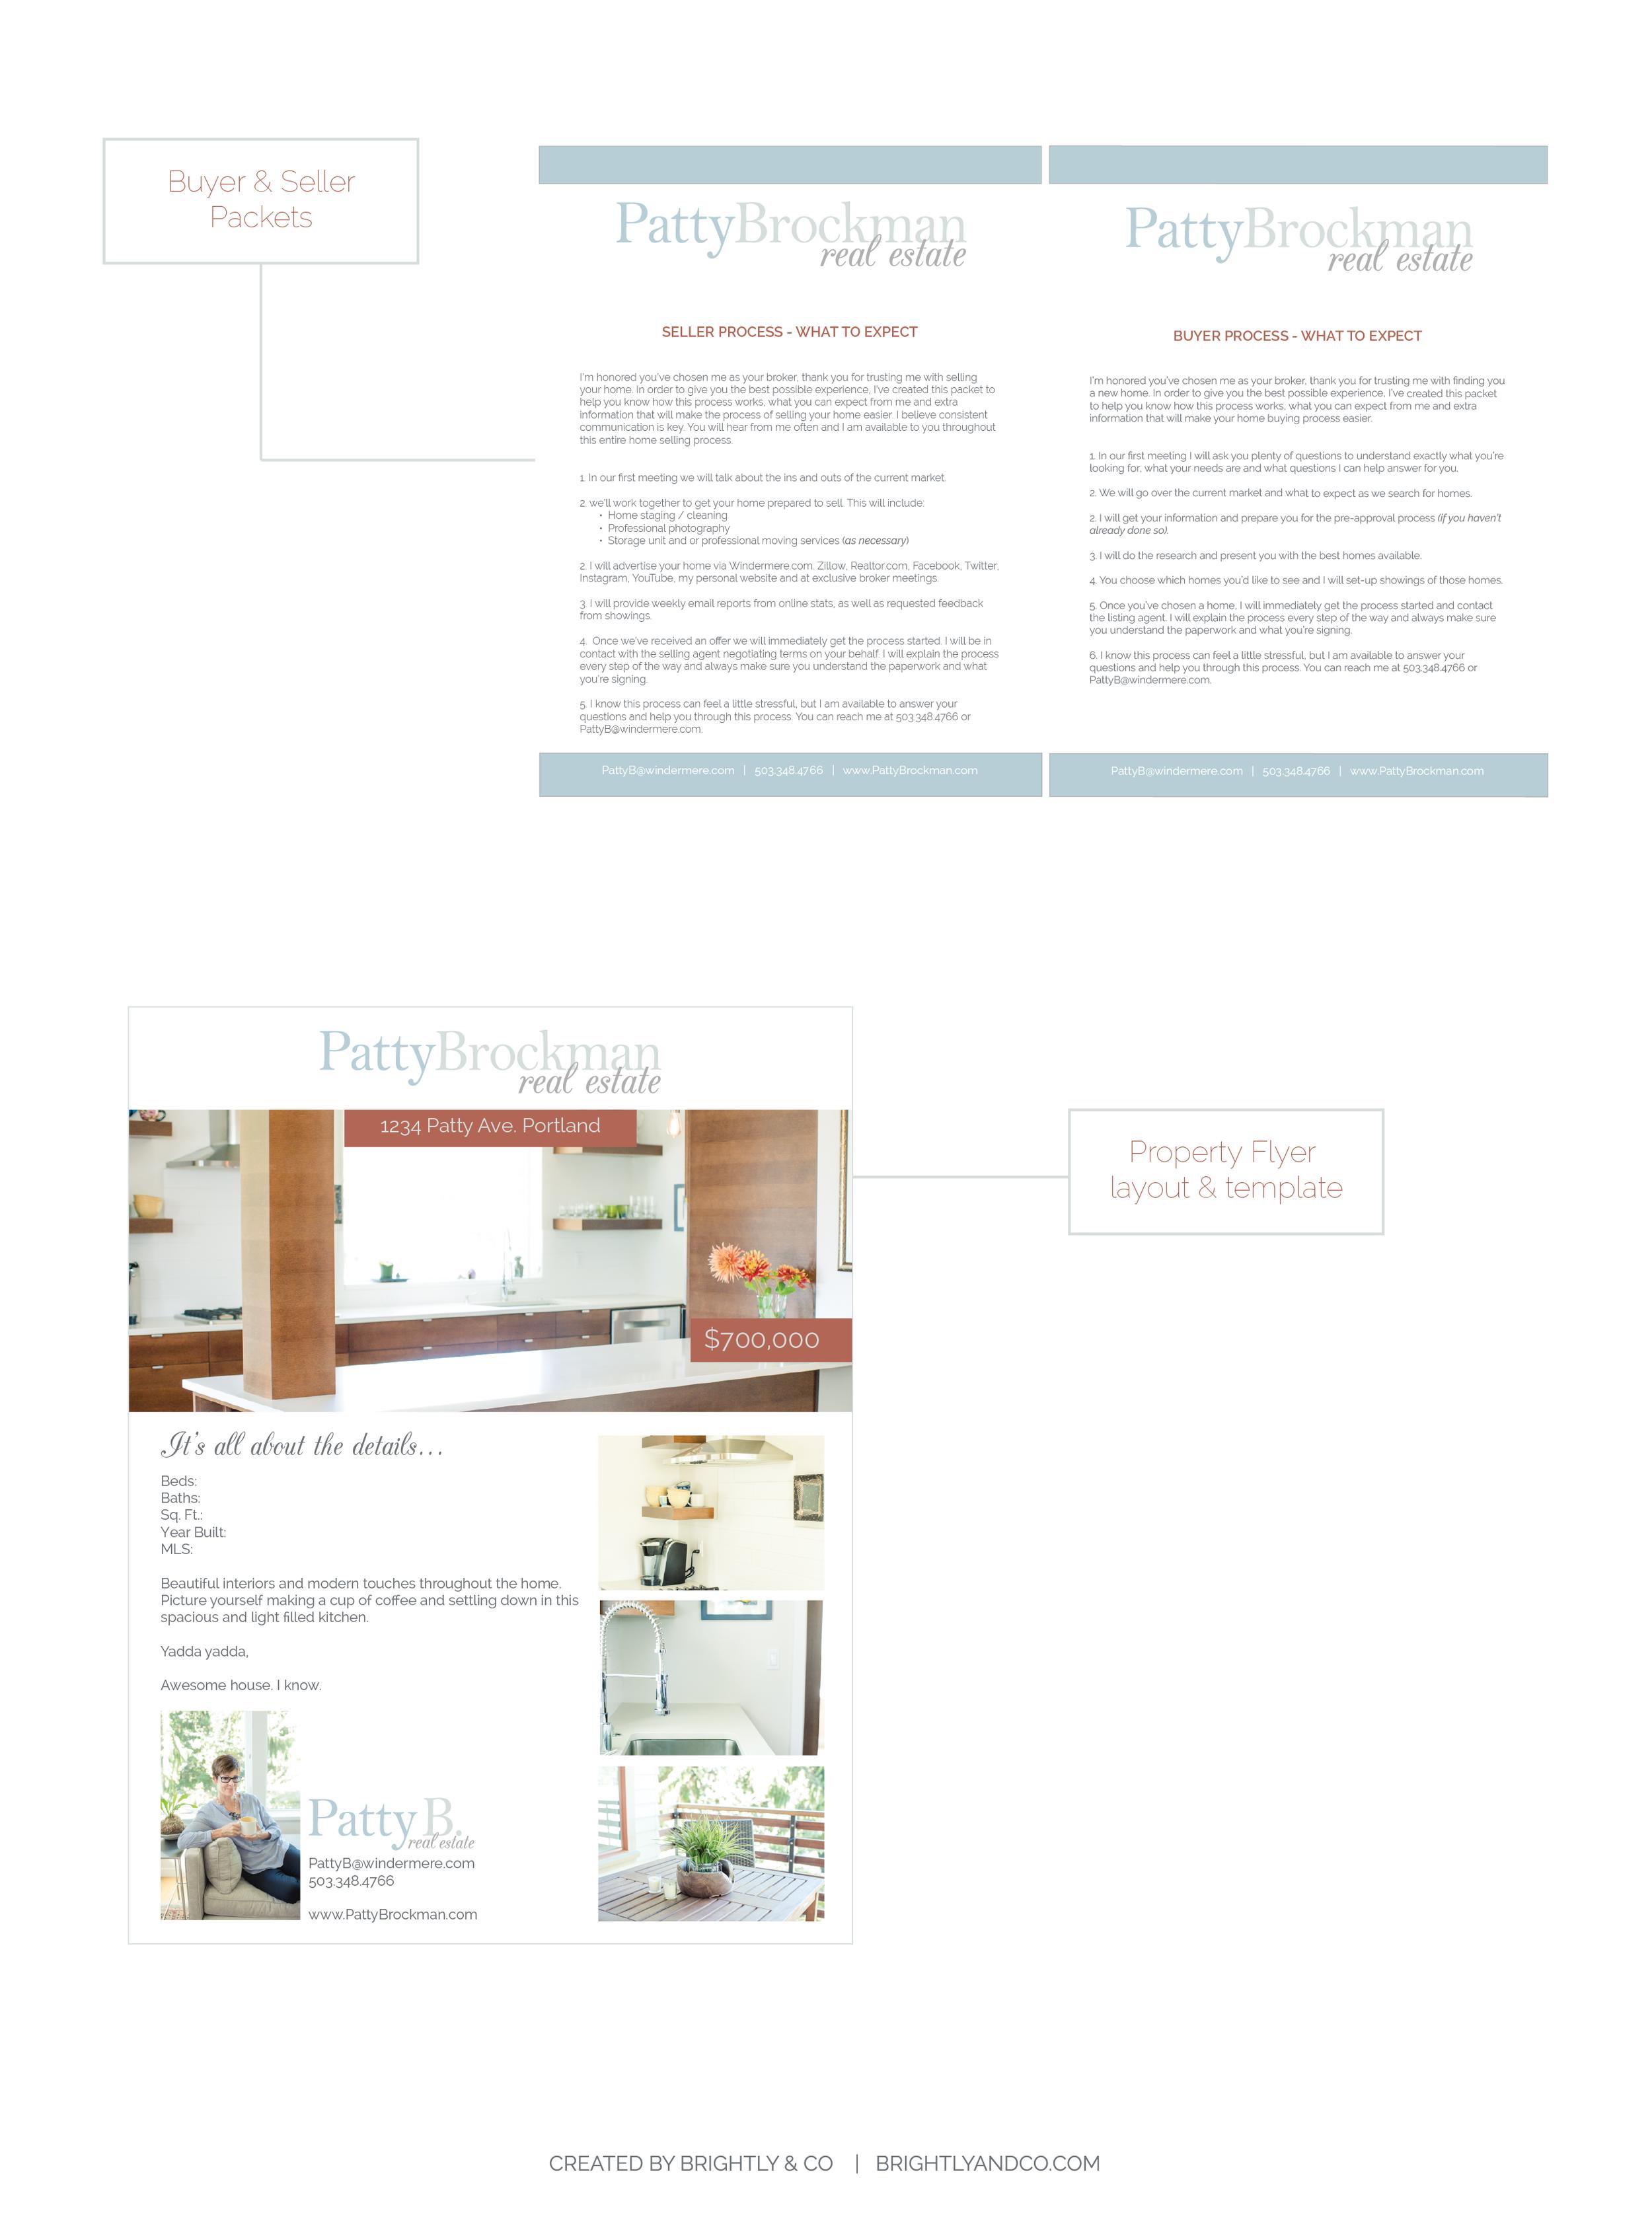 Patty Brockman Real Estate Brand Design - Business Essentials by Brightly & Co. | www.BrightlyandCo.com